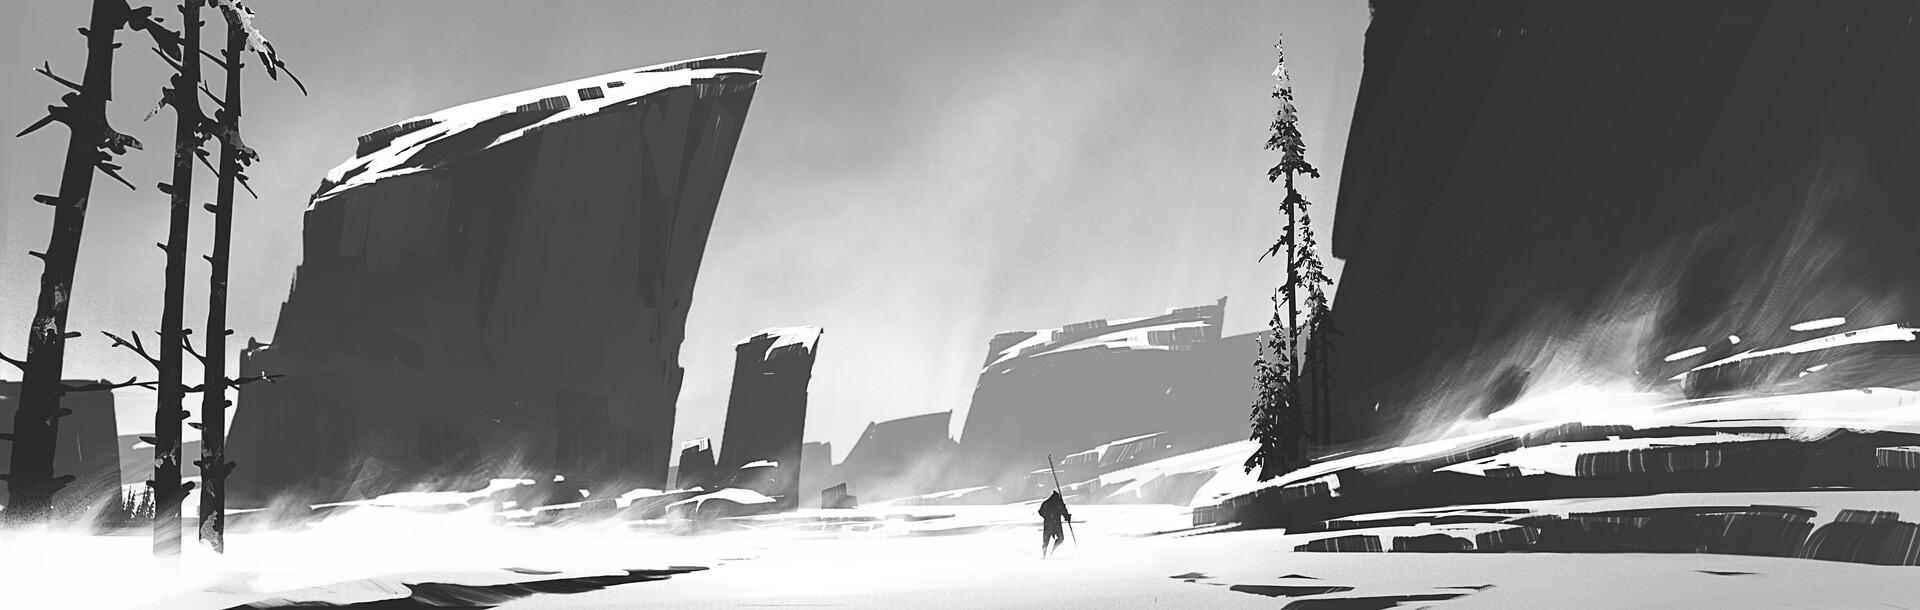 Advanced sketch #2